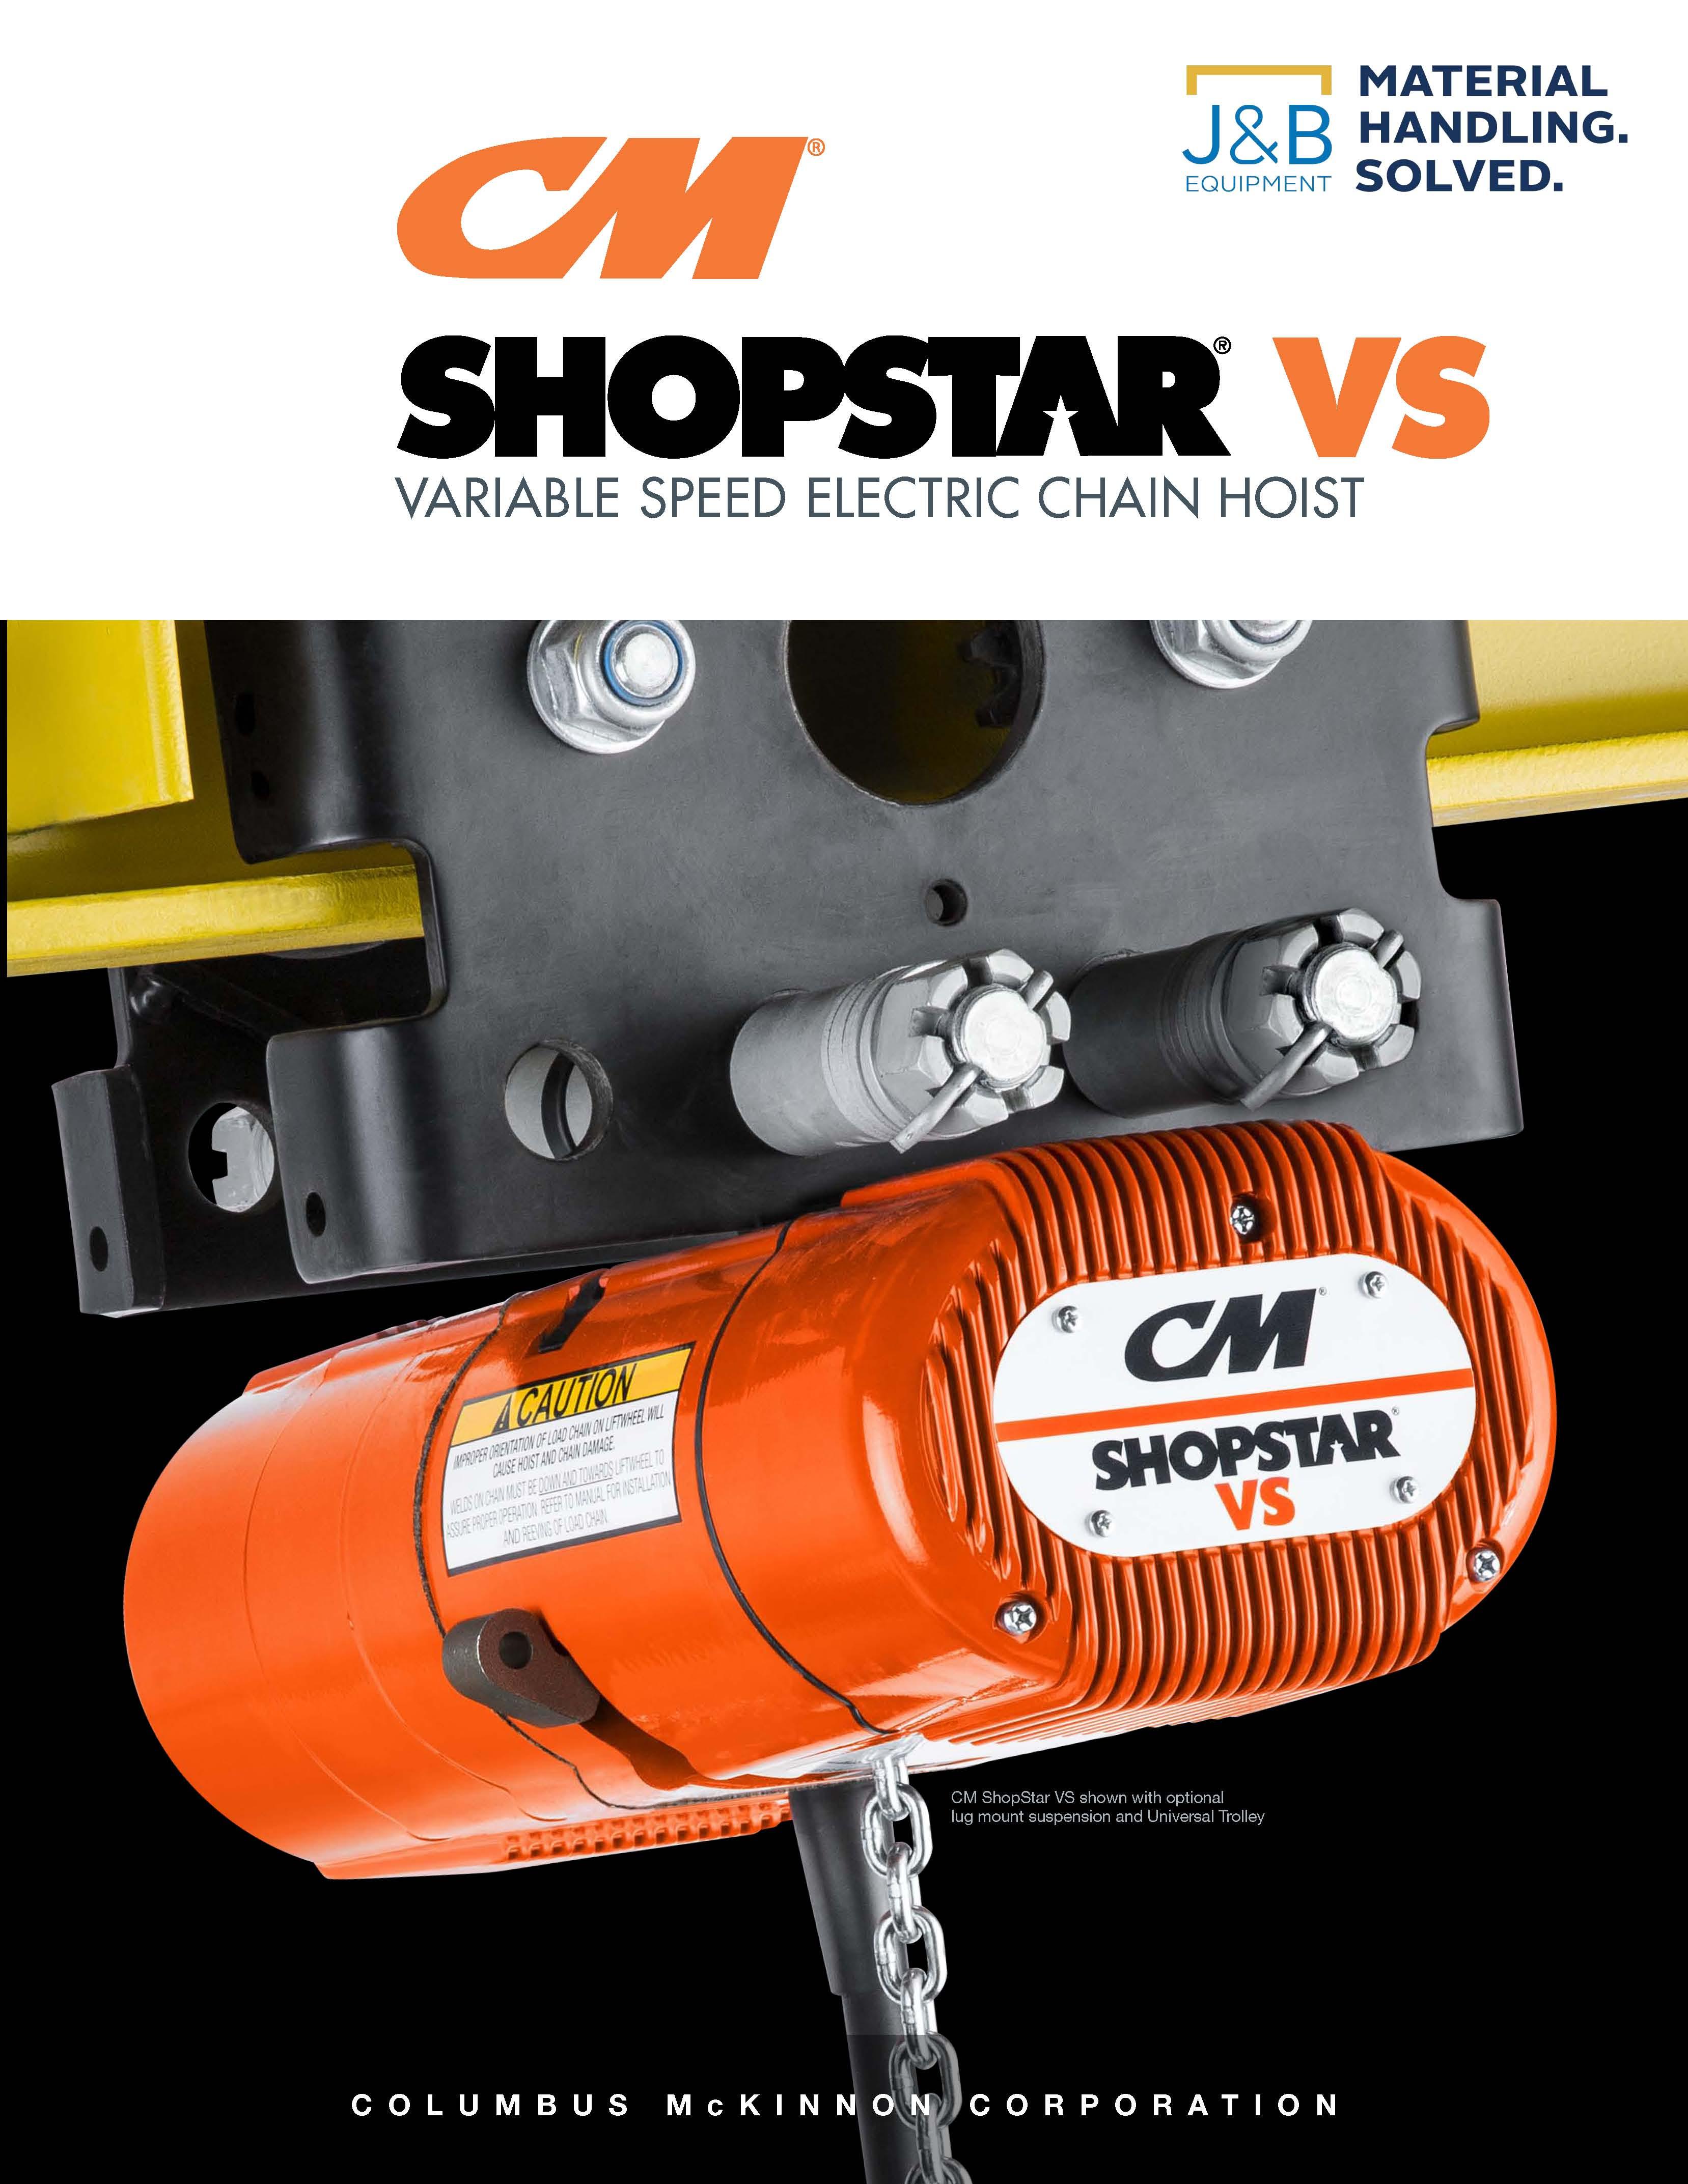 The CM ShopStar VS - A Superior Alternative to Air Hoists   Material  Handling Solutions   Minnesota   J & B Equipment Company